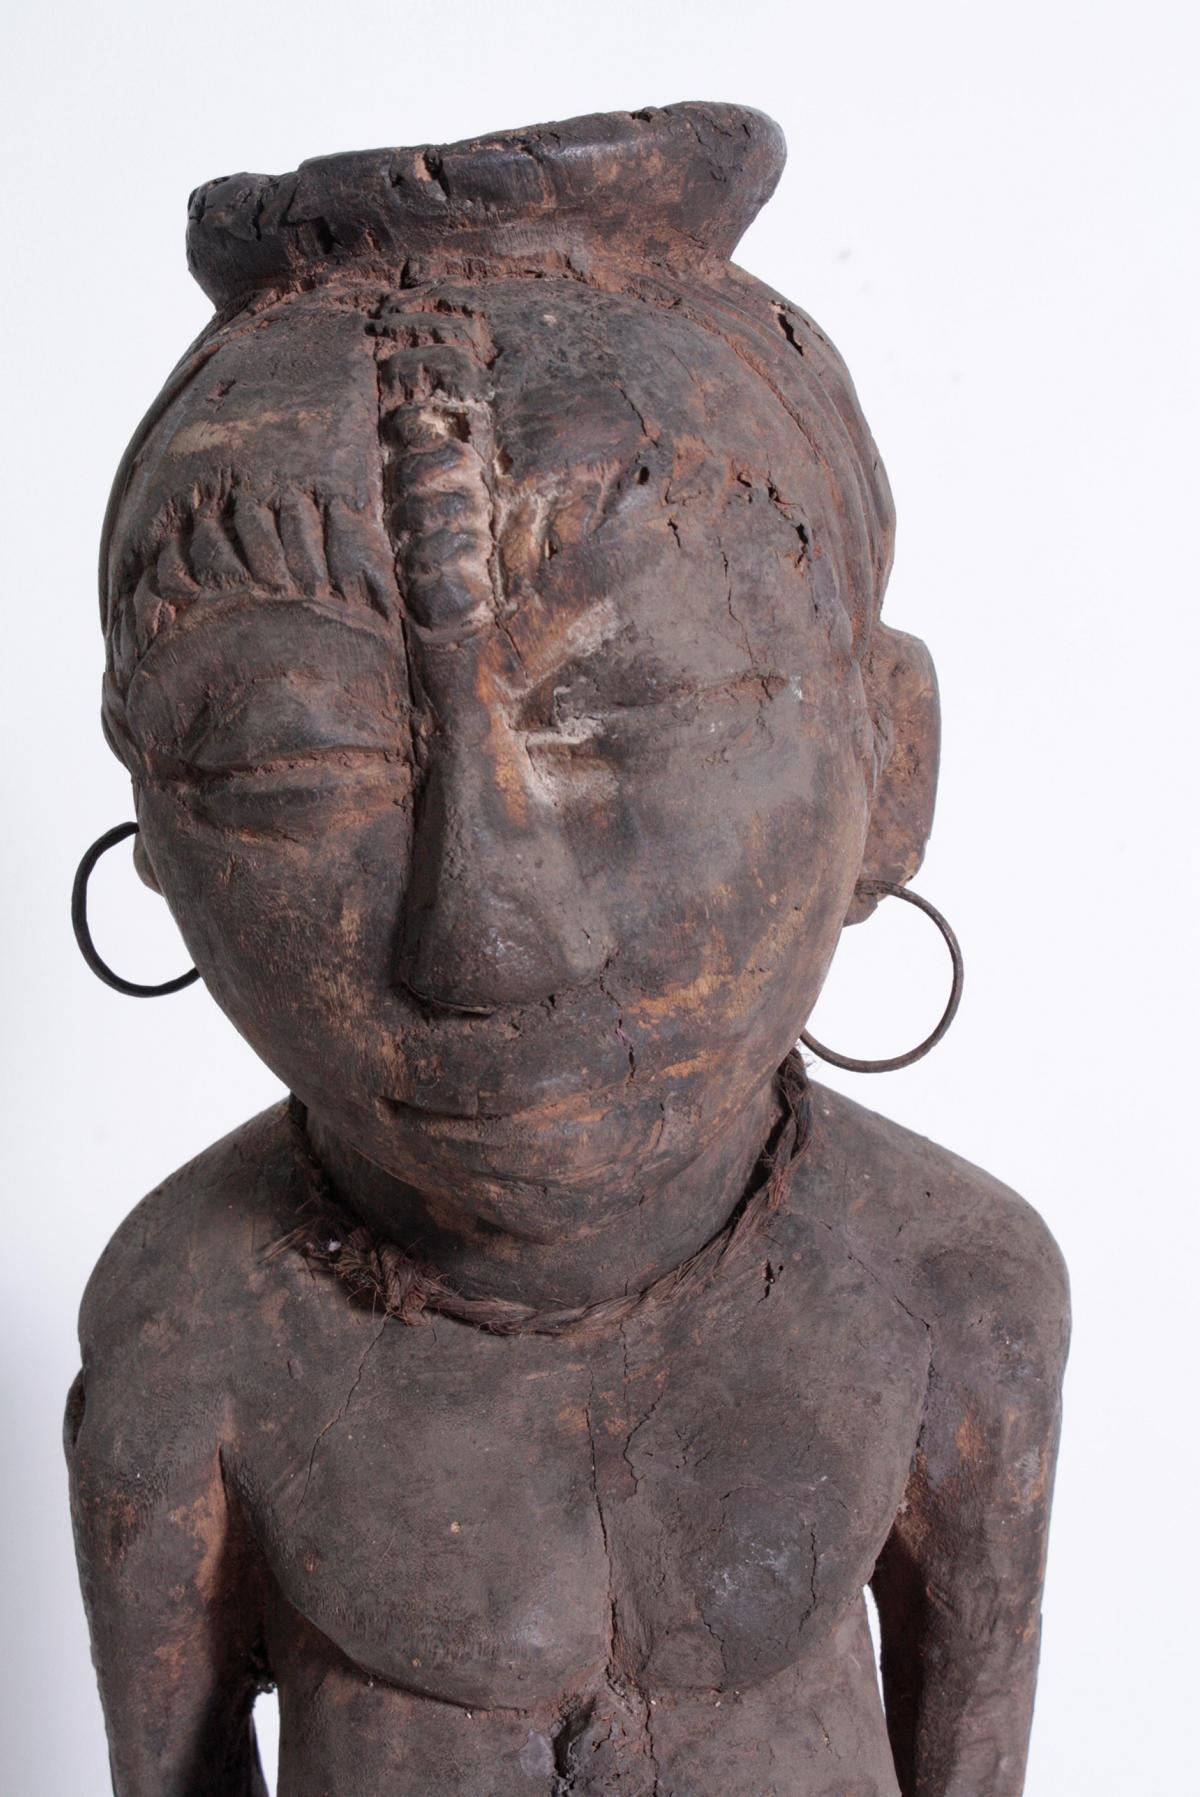 Ältere Ahnen-Figur, Tabwa, D. R. Kongo-2